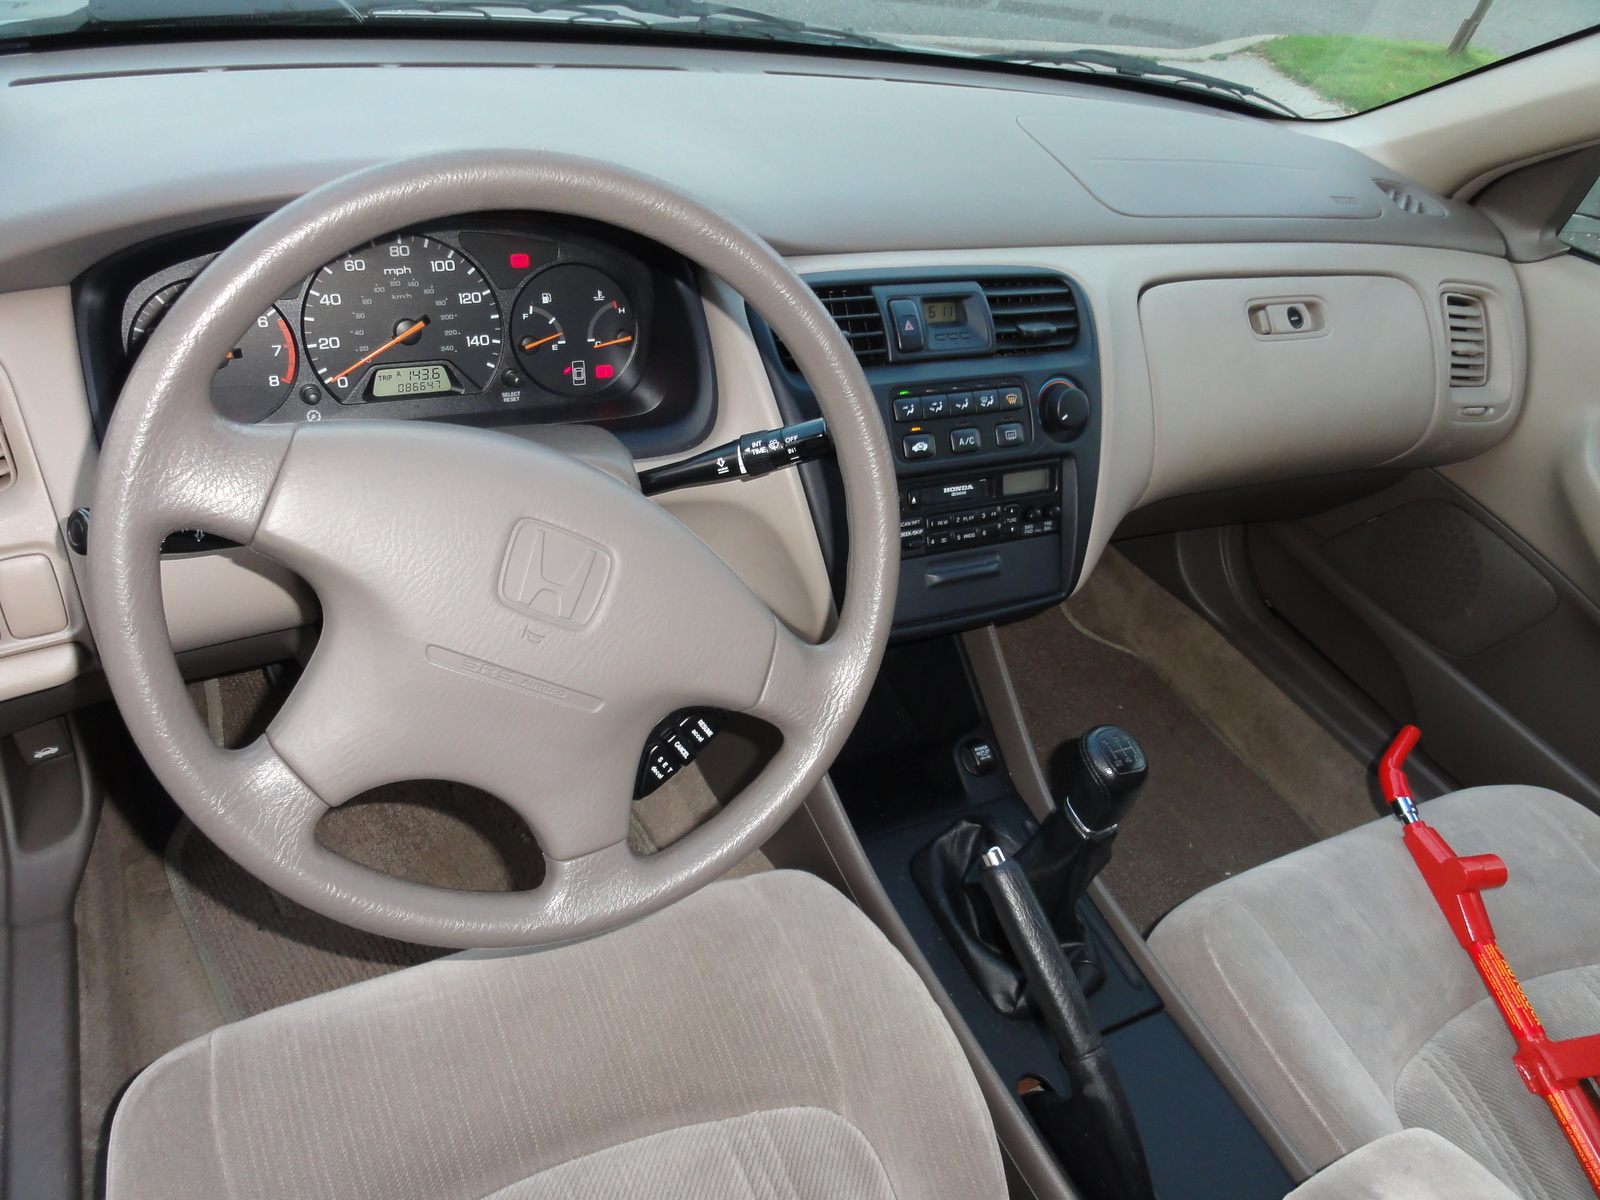 1999 honda accord interior auto blog picture of 1999 honda accord lx interior